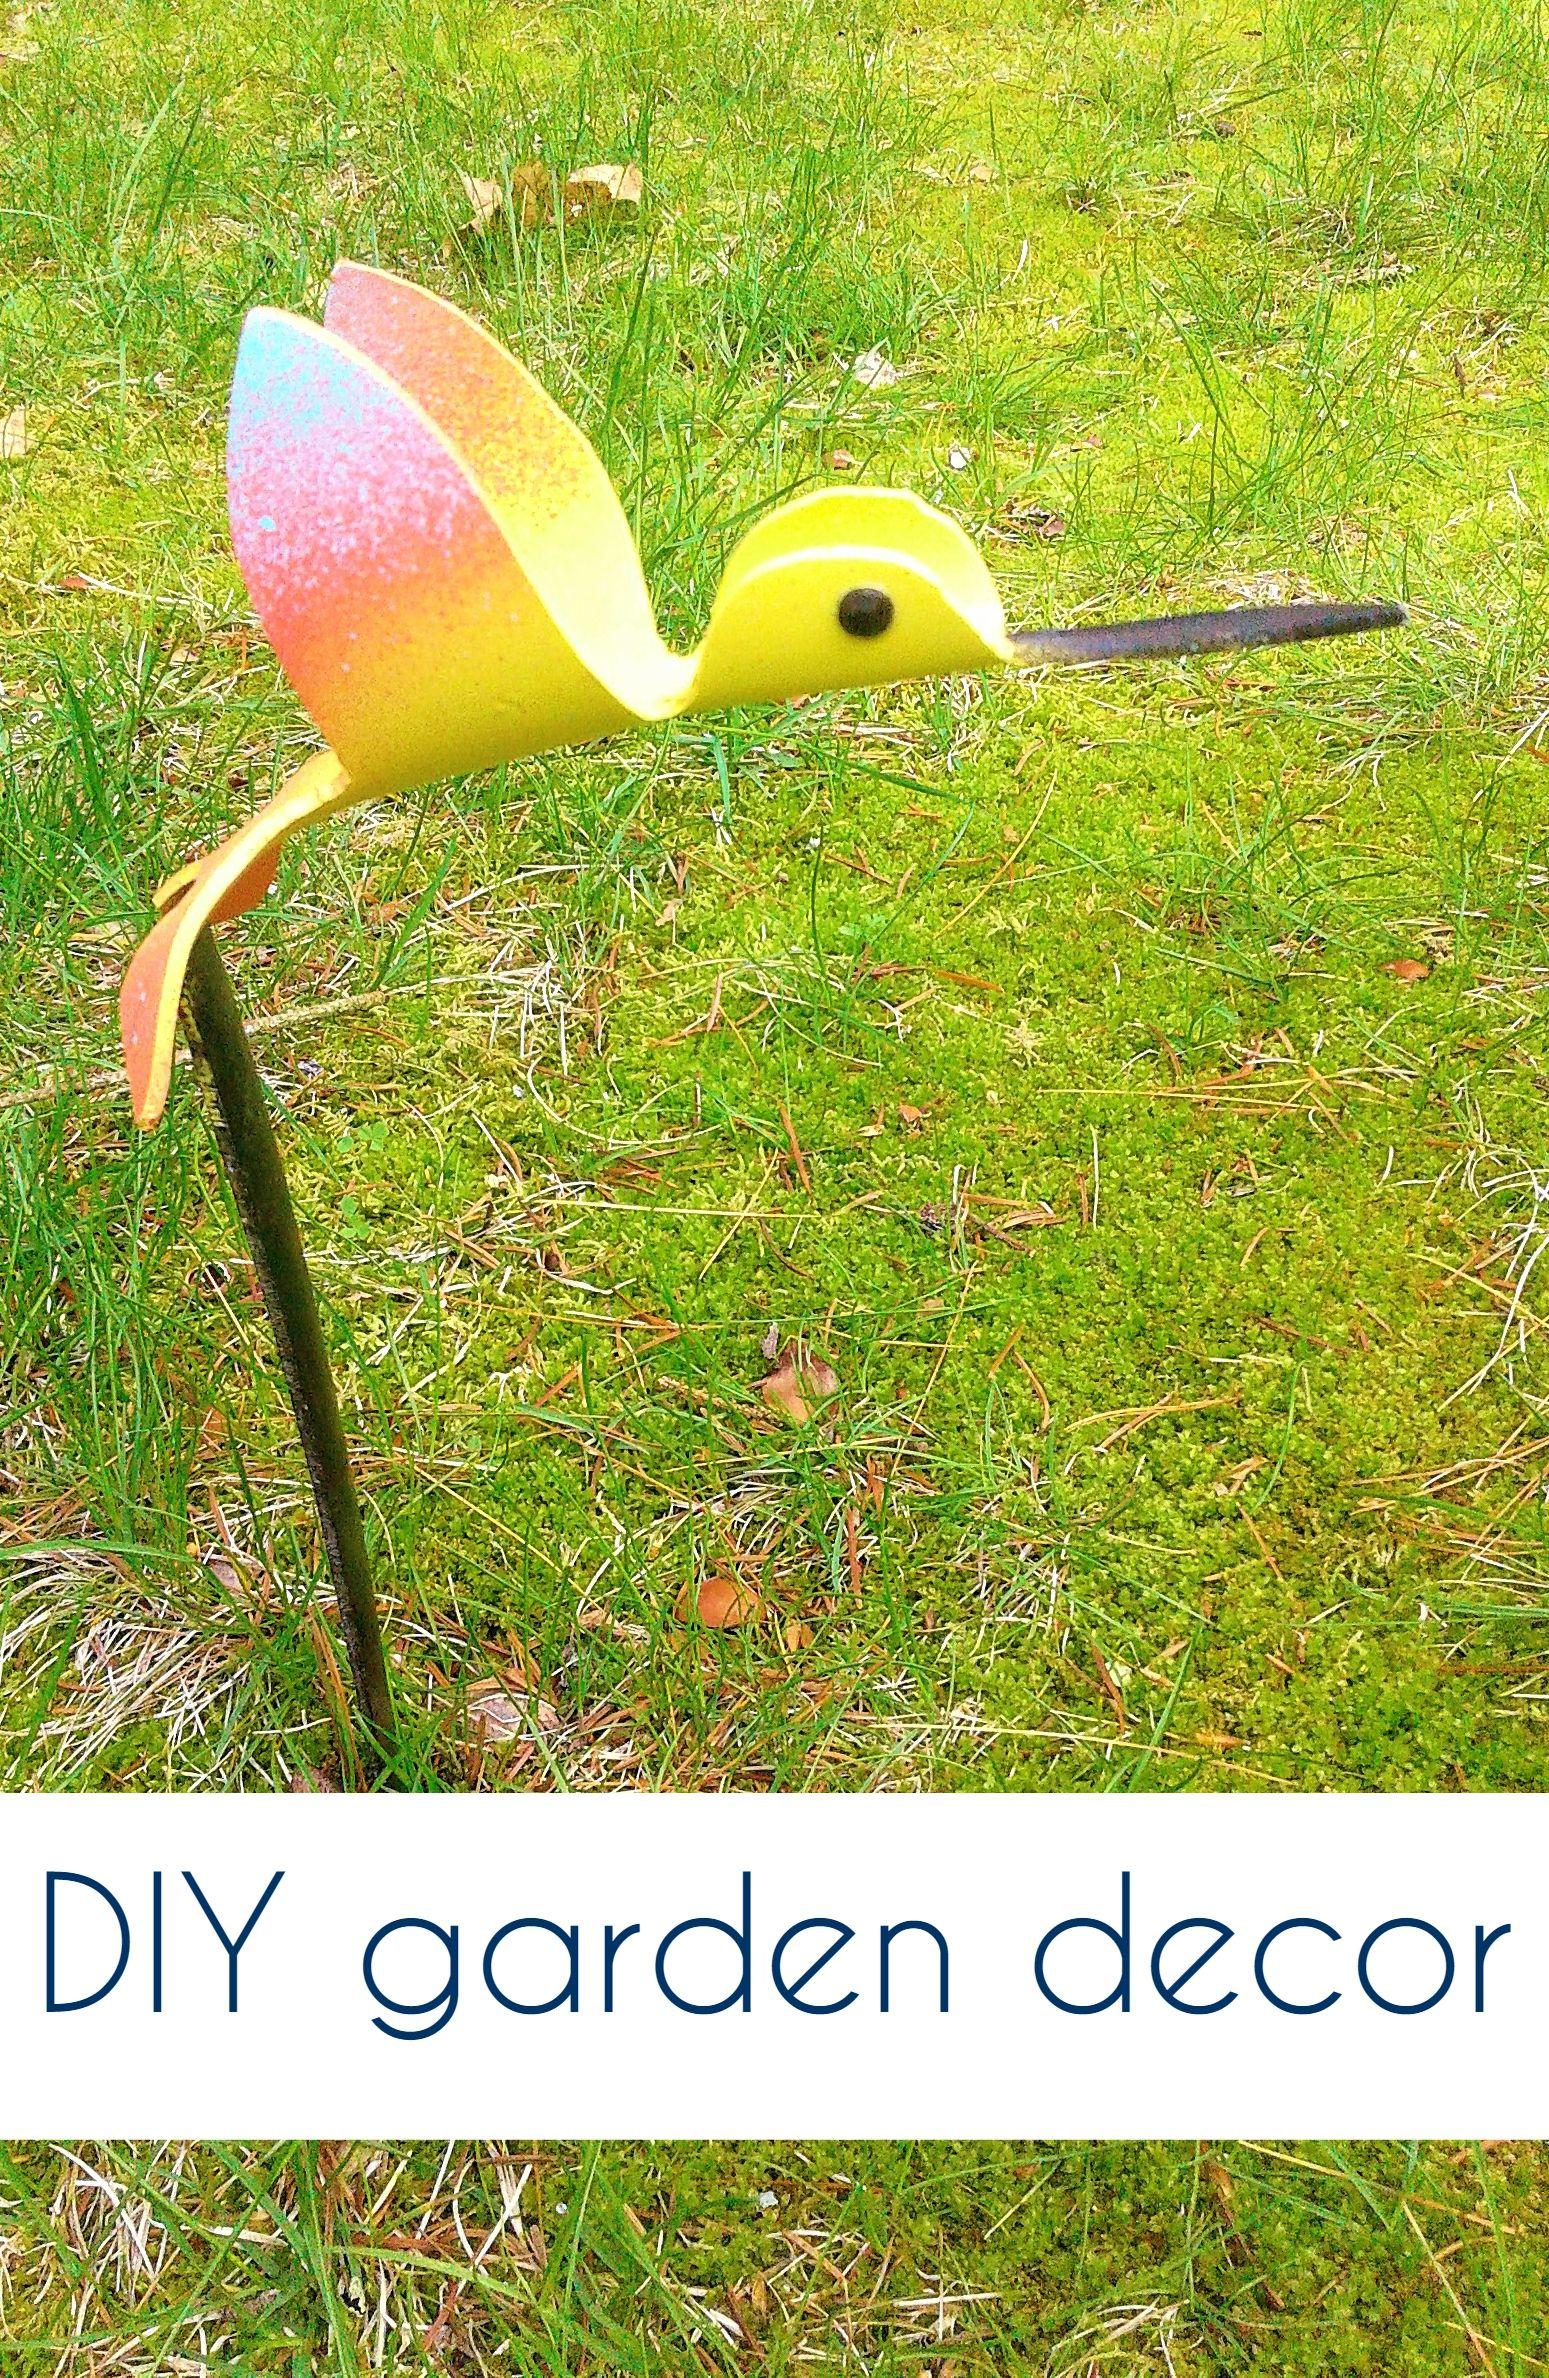 Add Some Adorable Yard Art To Your Garden With These Sweet Little Pvc Hummingbirds Pvcpipebirds Gardendecor Flamingo Yard Decor Diy Outdoor Decor Yard Art